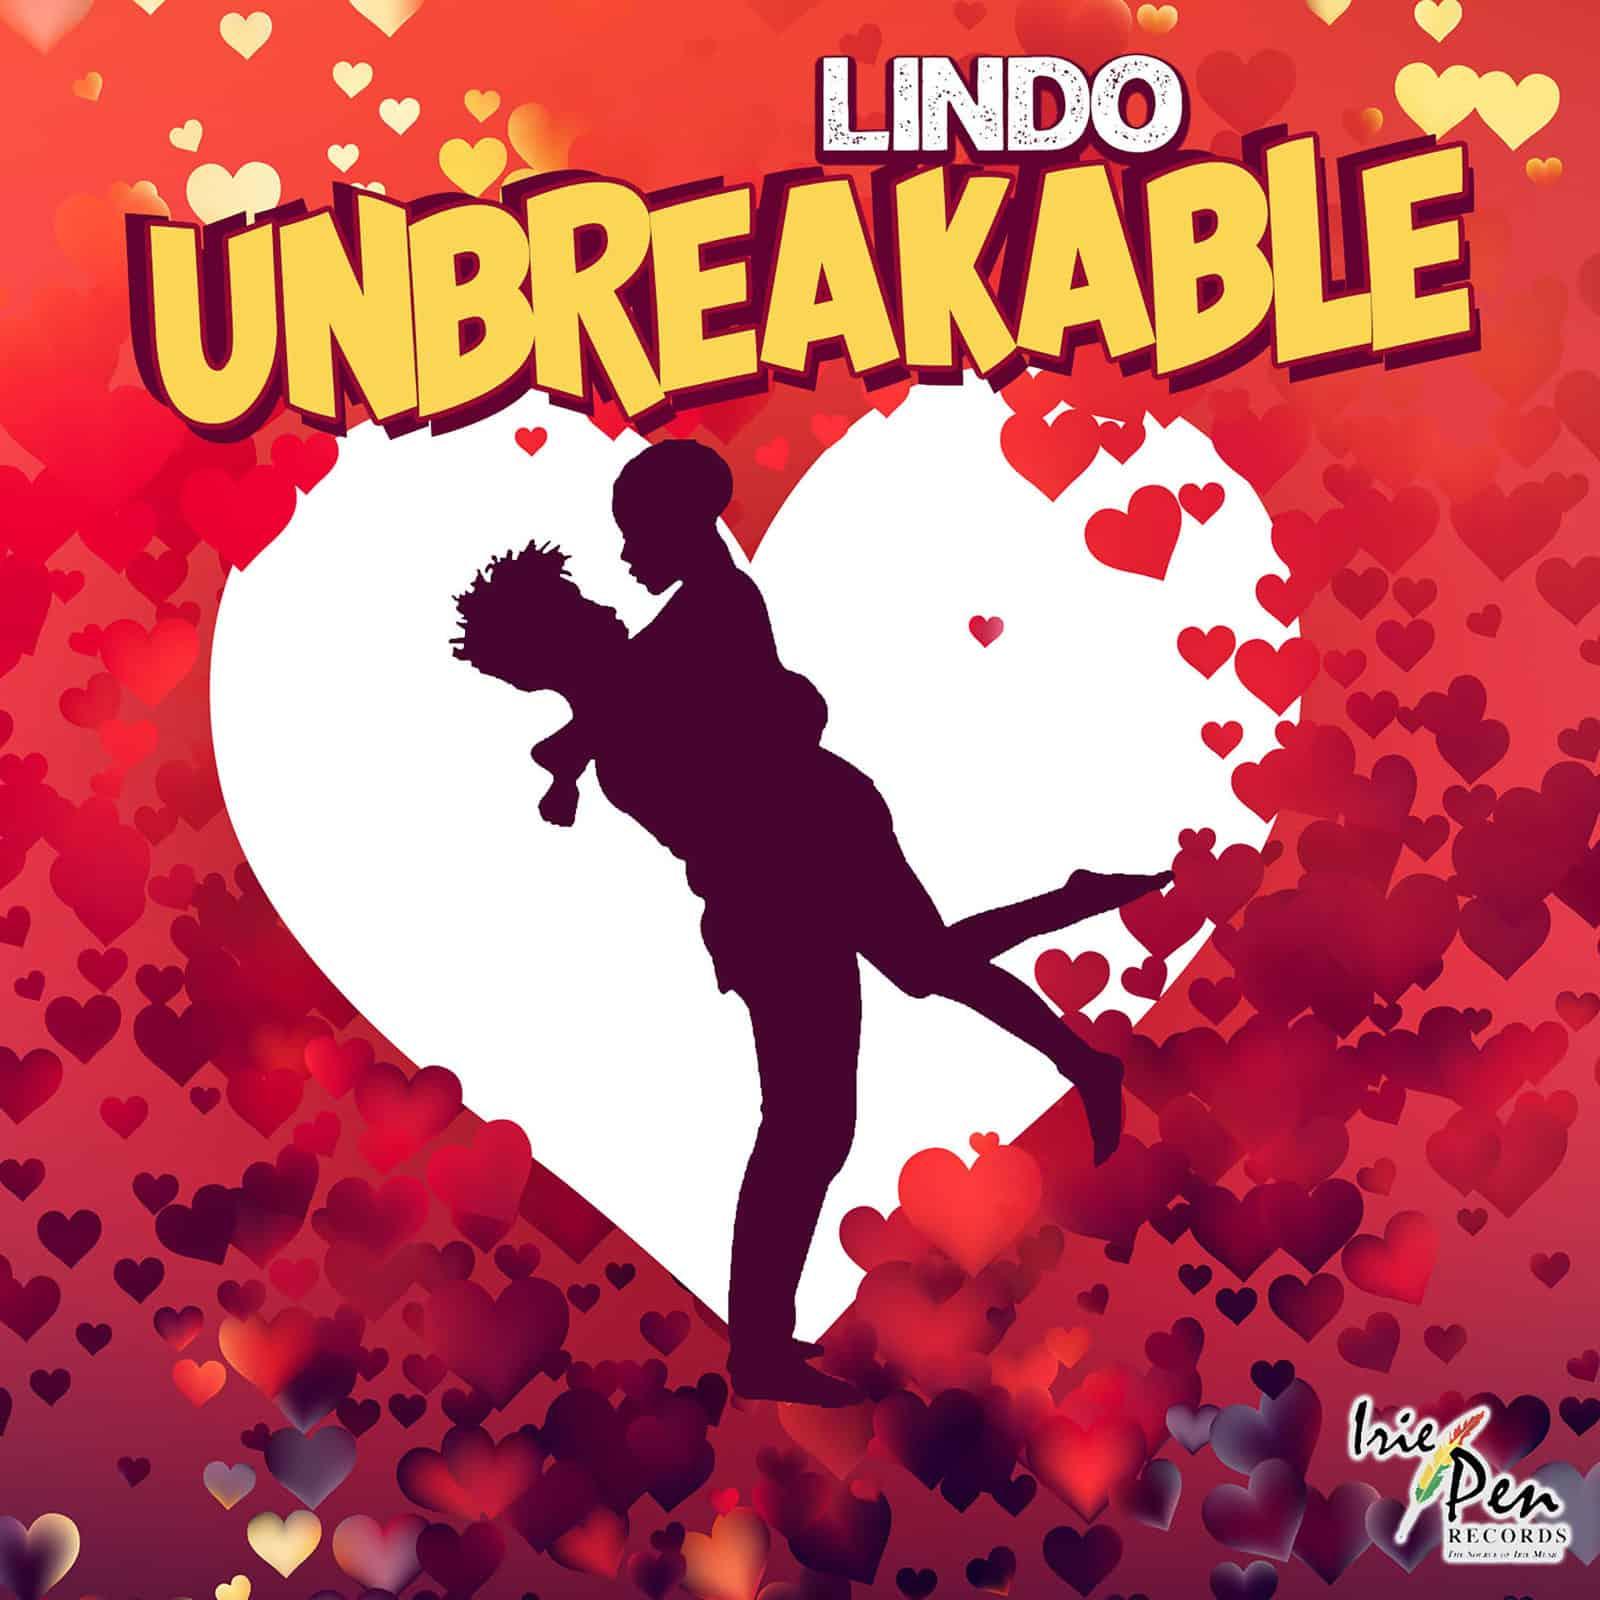 Lindo - Unbreakable - Irie Pen Records